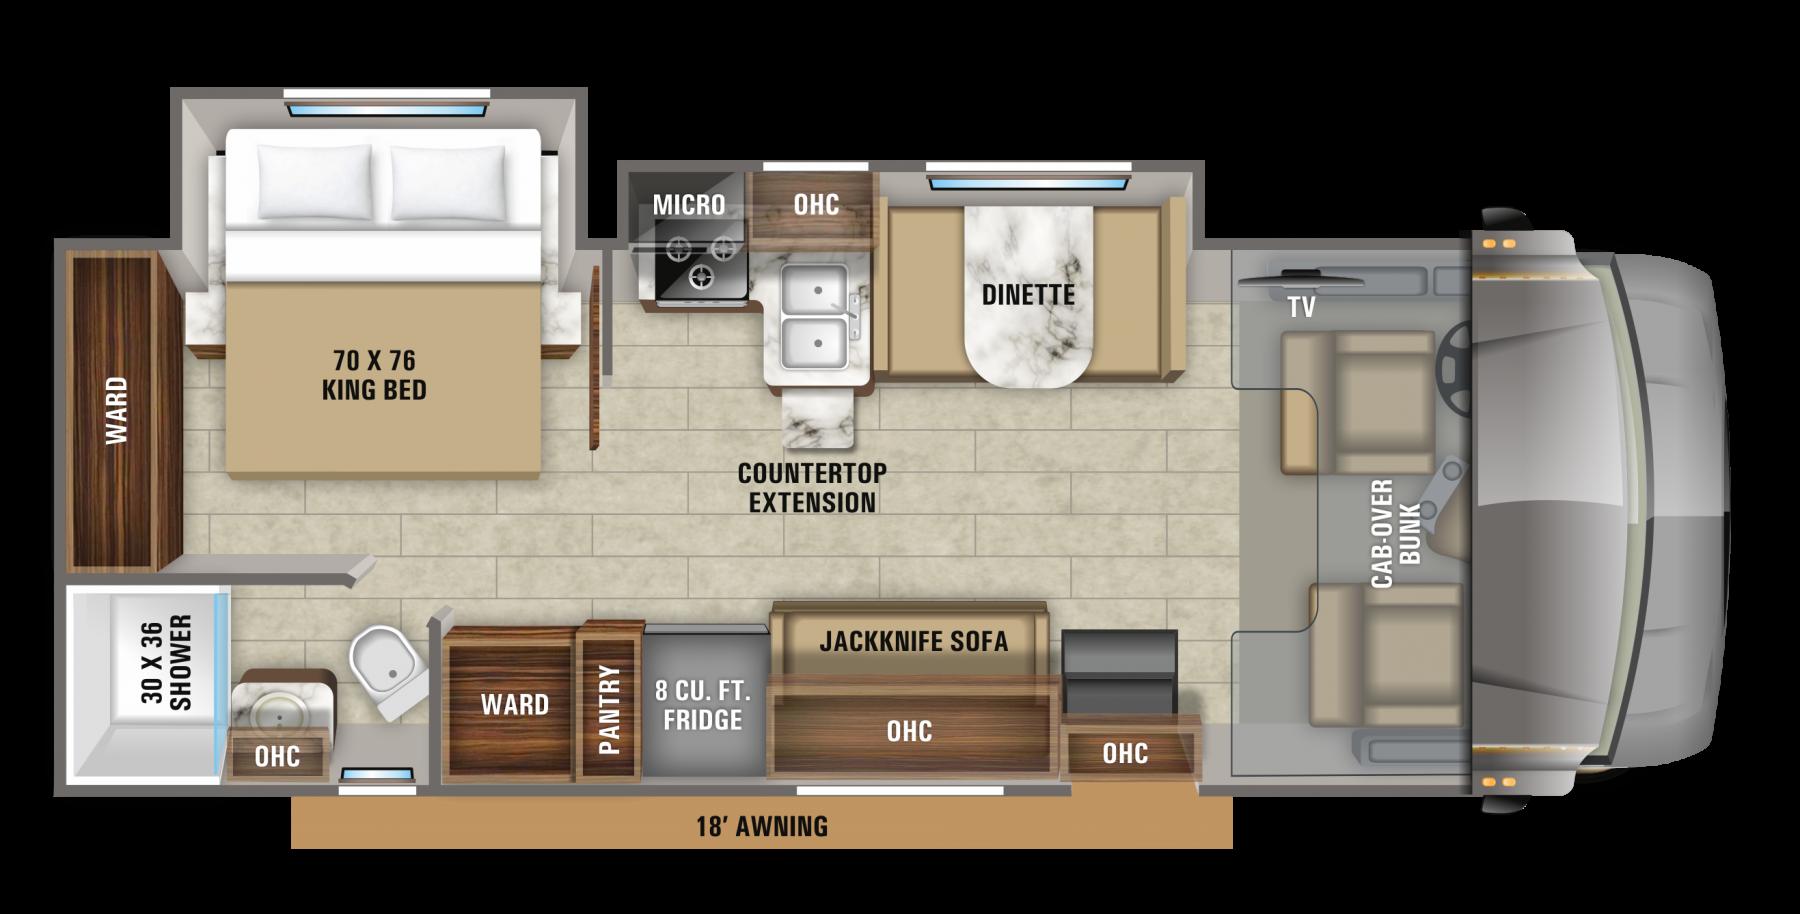 jayco greyhawk 27u floorplan options